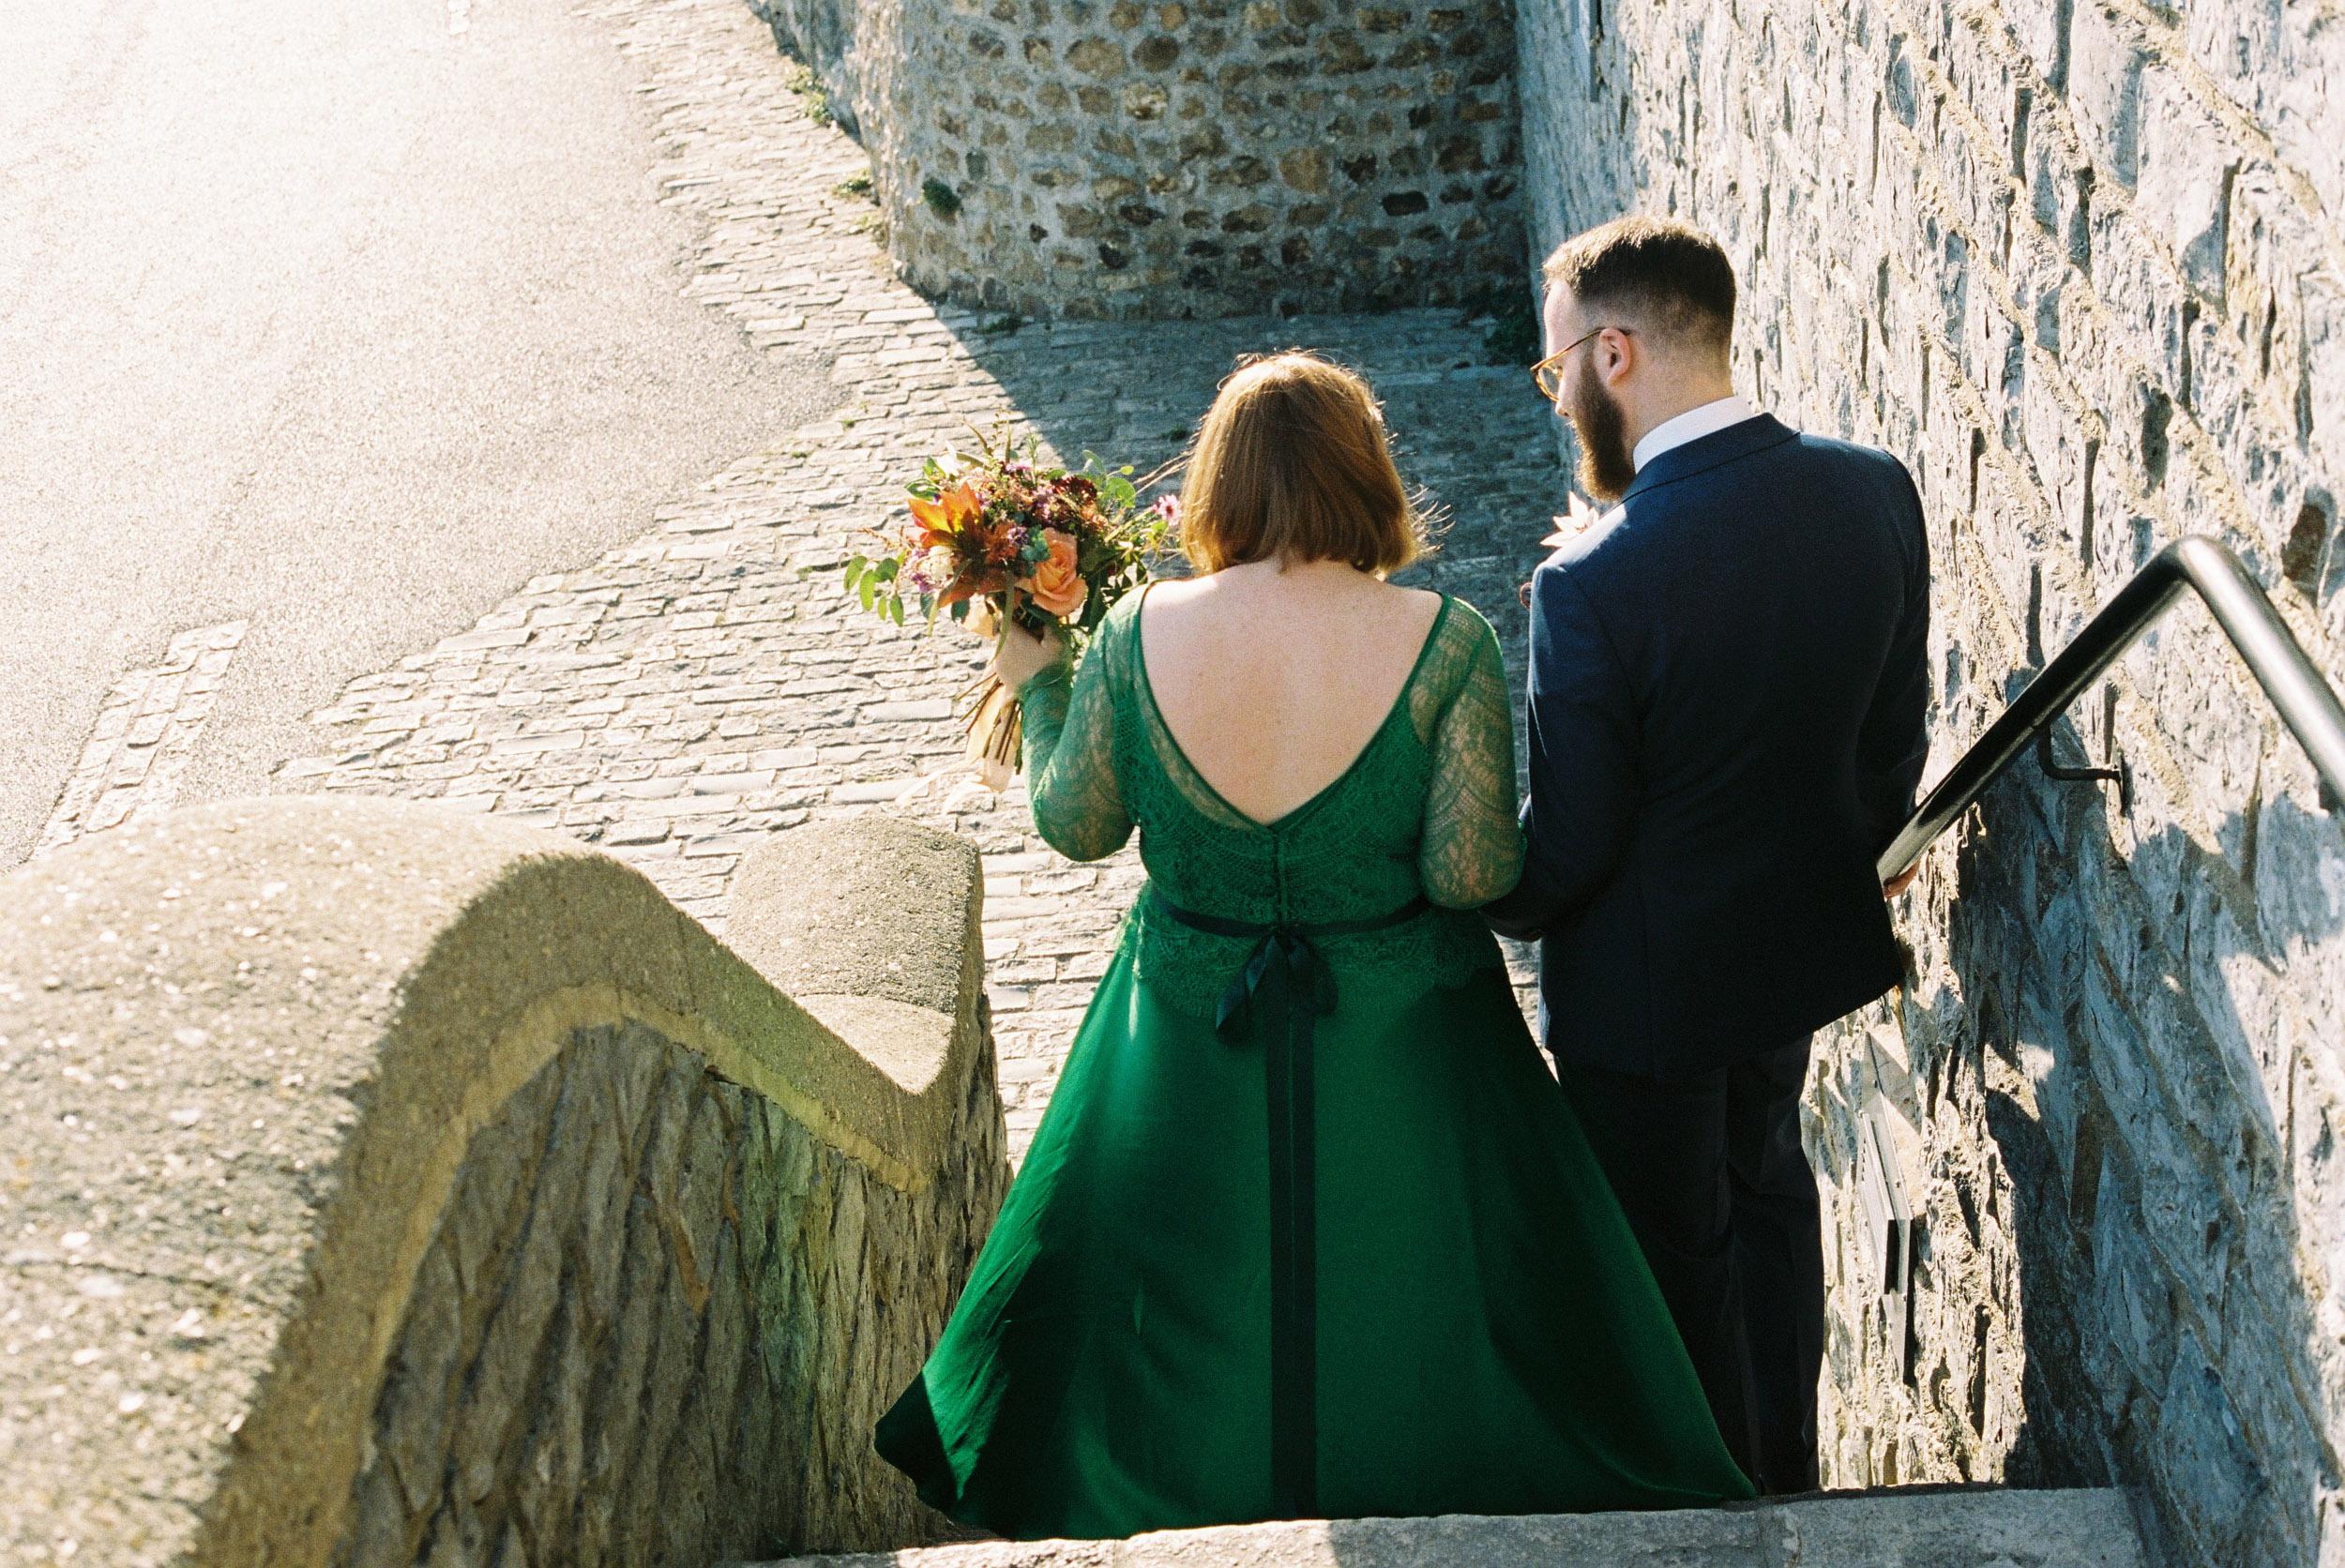 Lucy-Bespoke-Green-Silk-Lace-Wedding-Dress-Kate-Beaumont-Sheffield-15.jpg